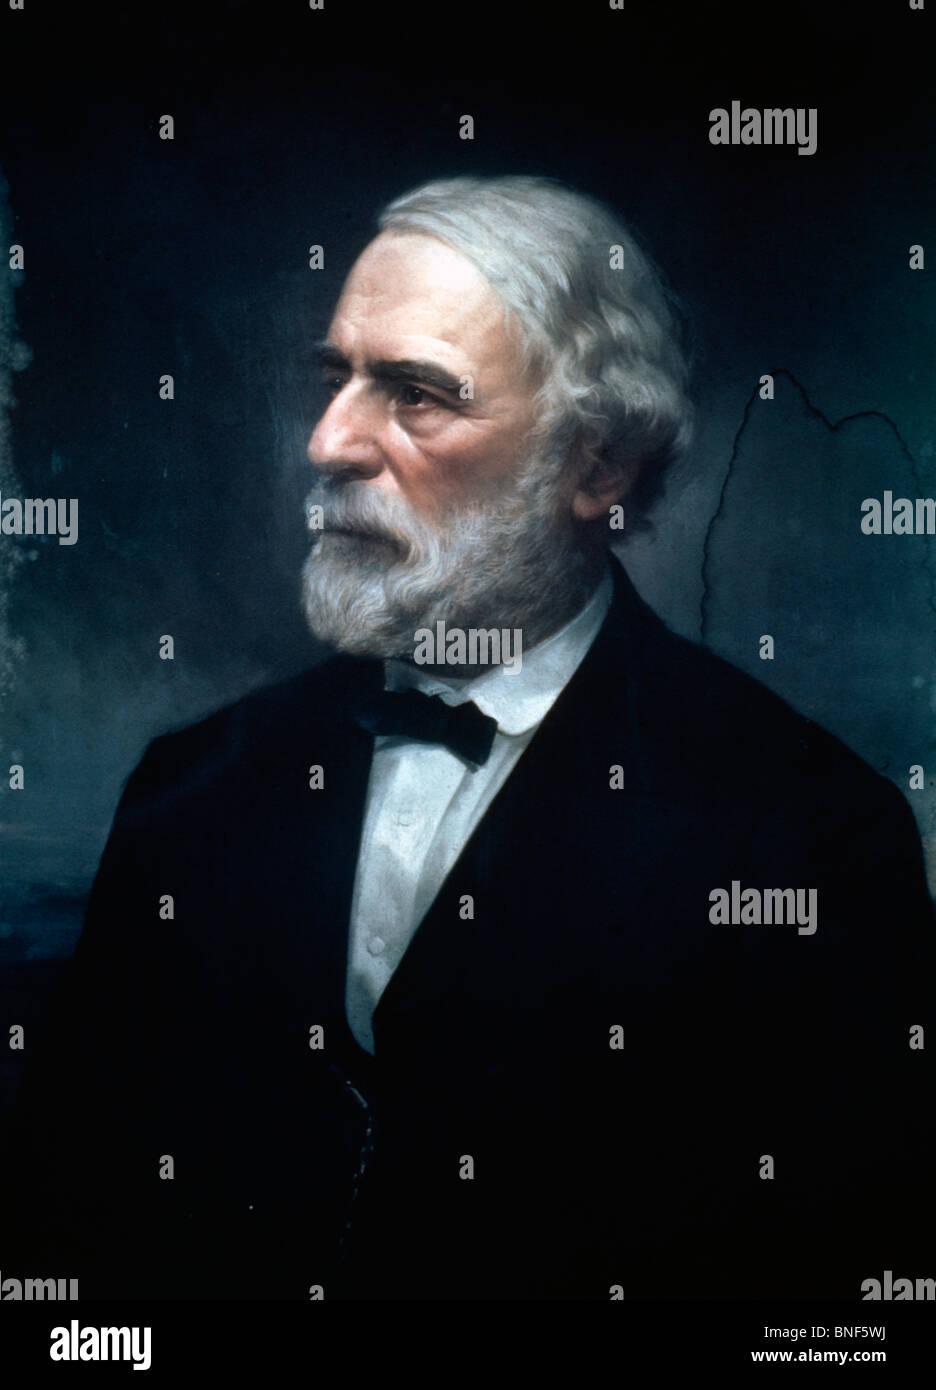 Robert E. Lee, artist unknown, 1860s - Stock Image